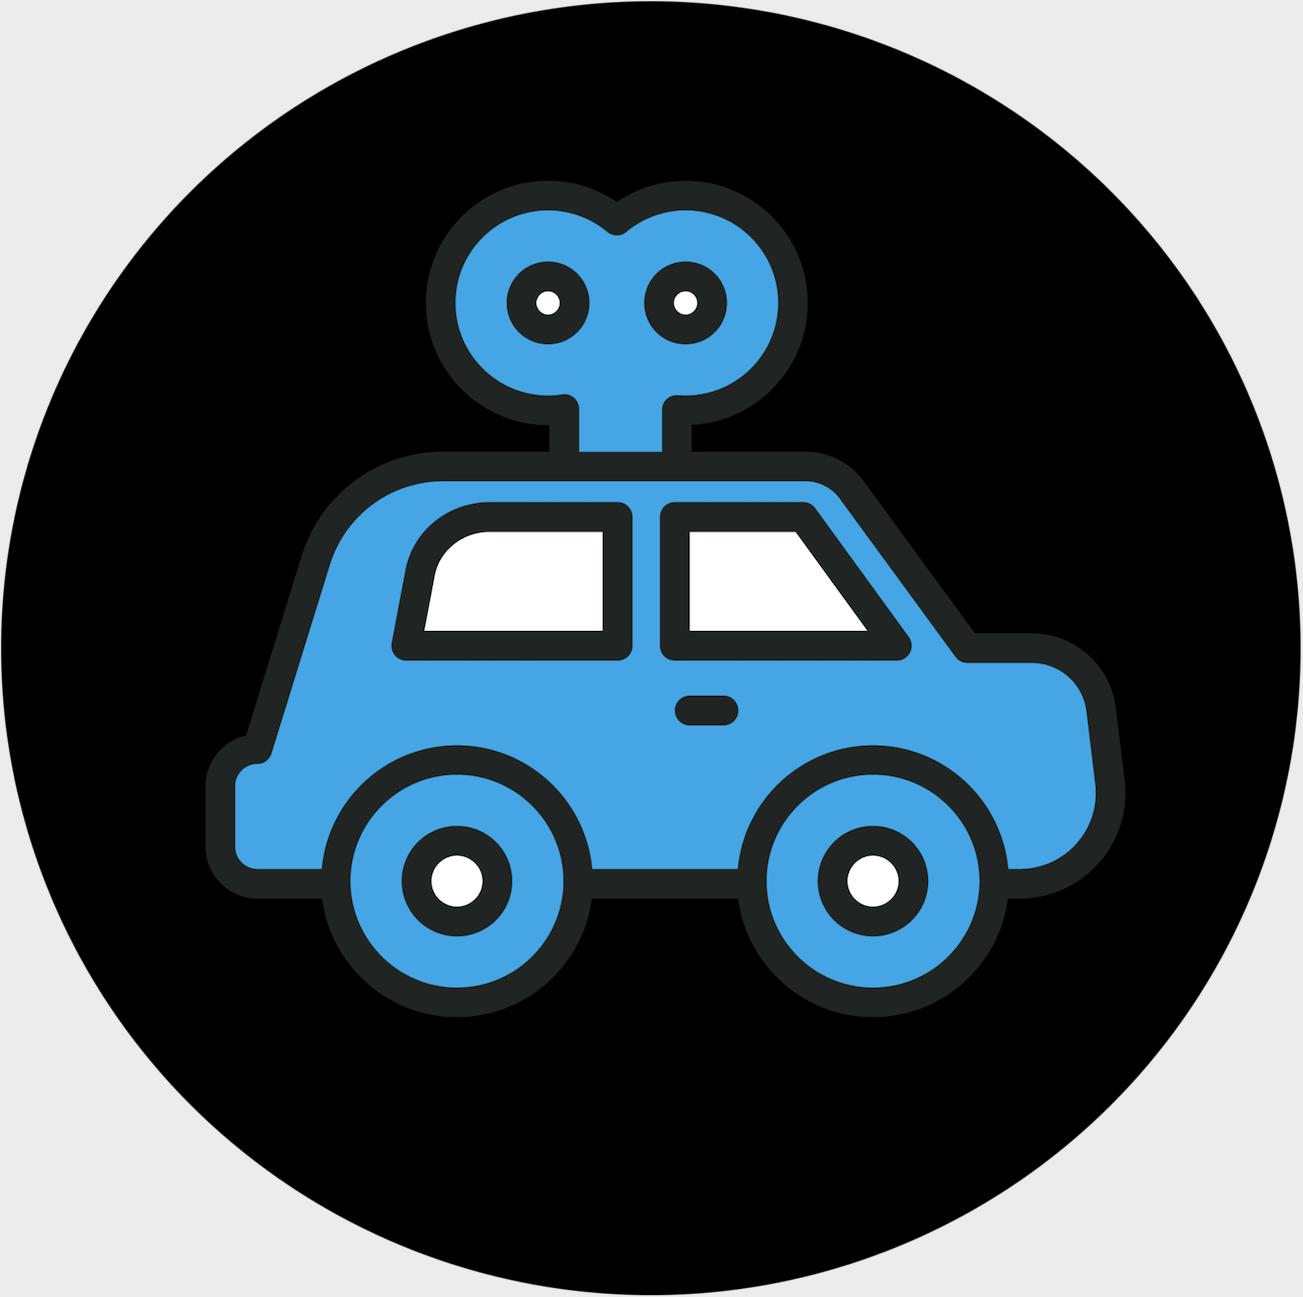 control-icon